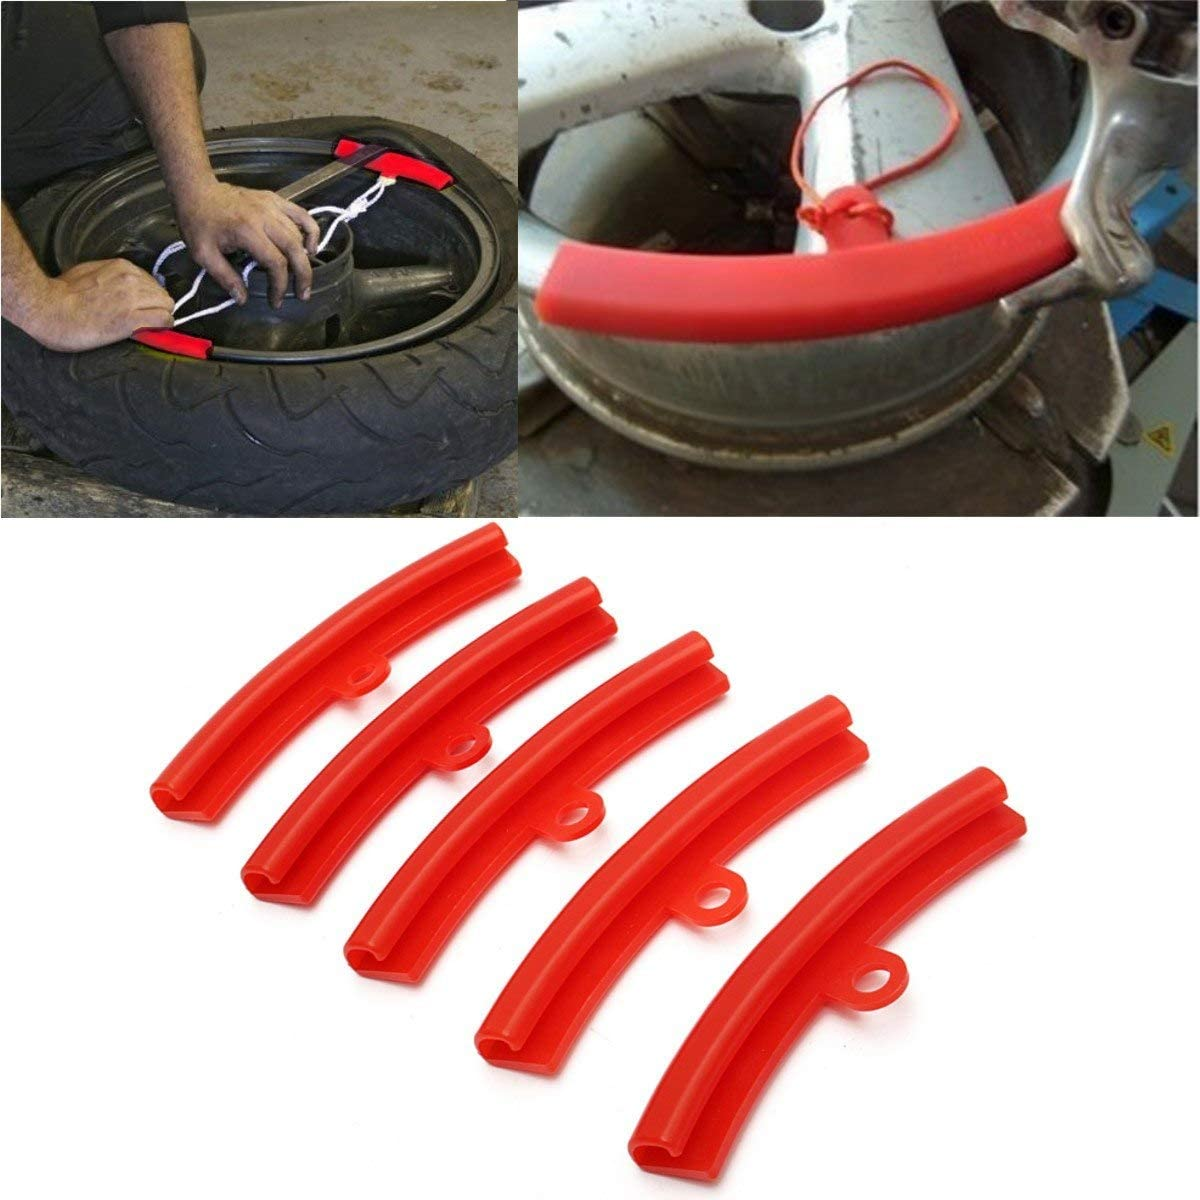 5 pcs Motorcycle Bike Tire Wheel Changer Guard Rim Protector Tyre Changing Edge